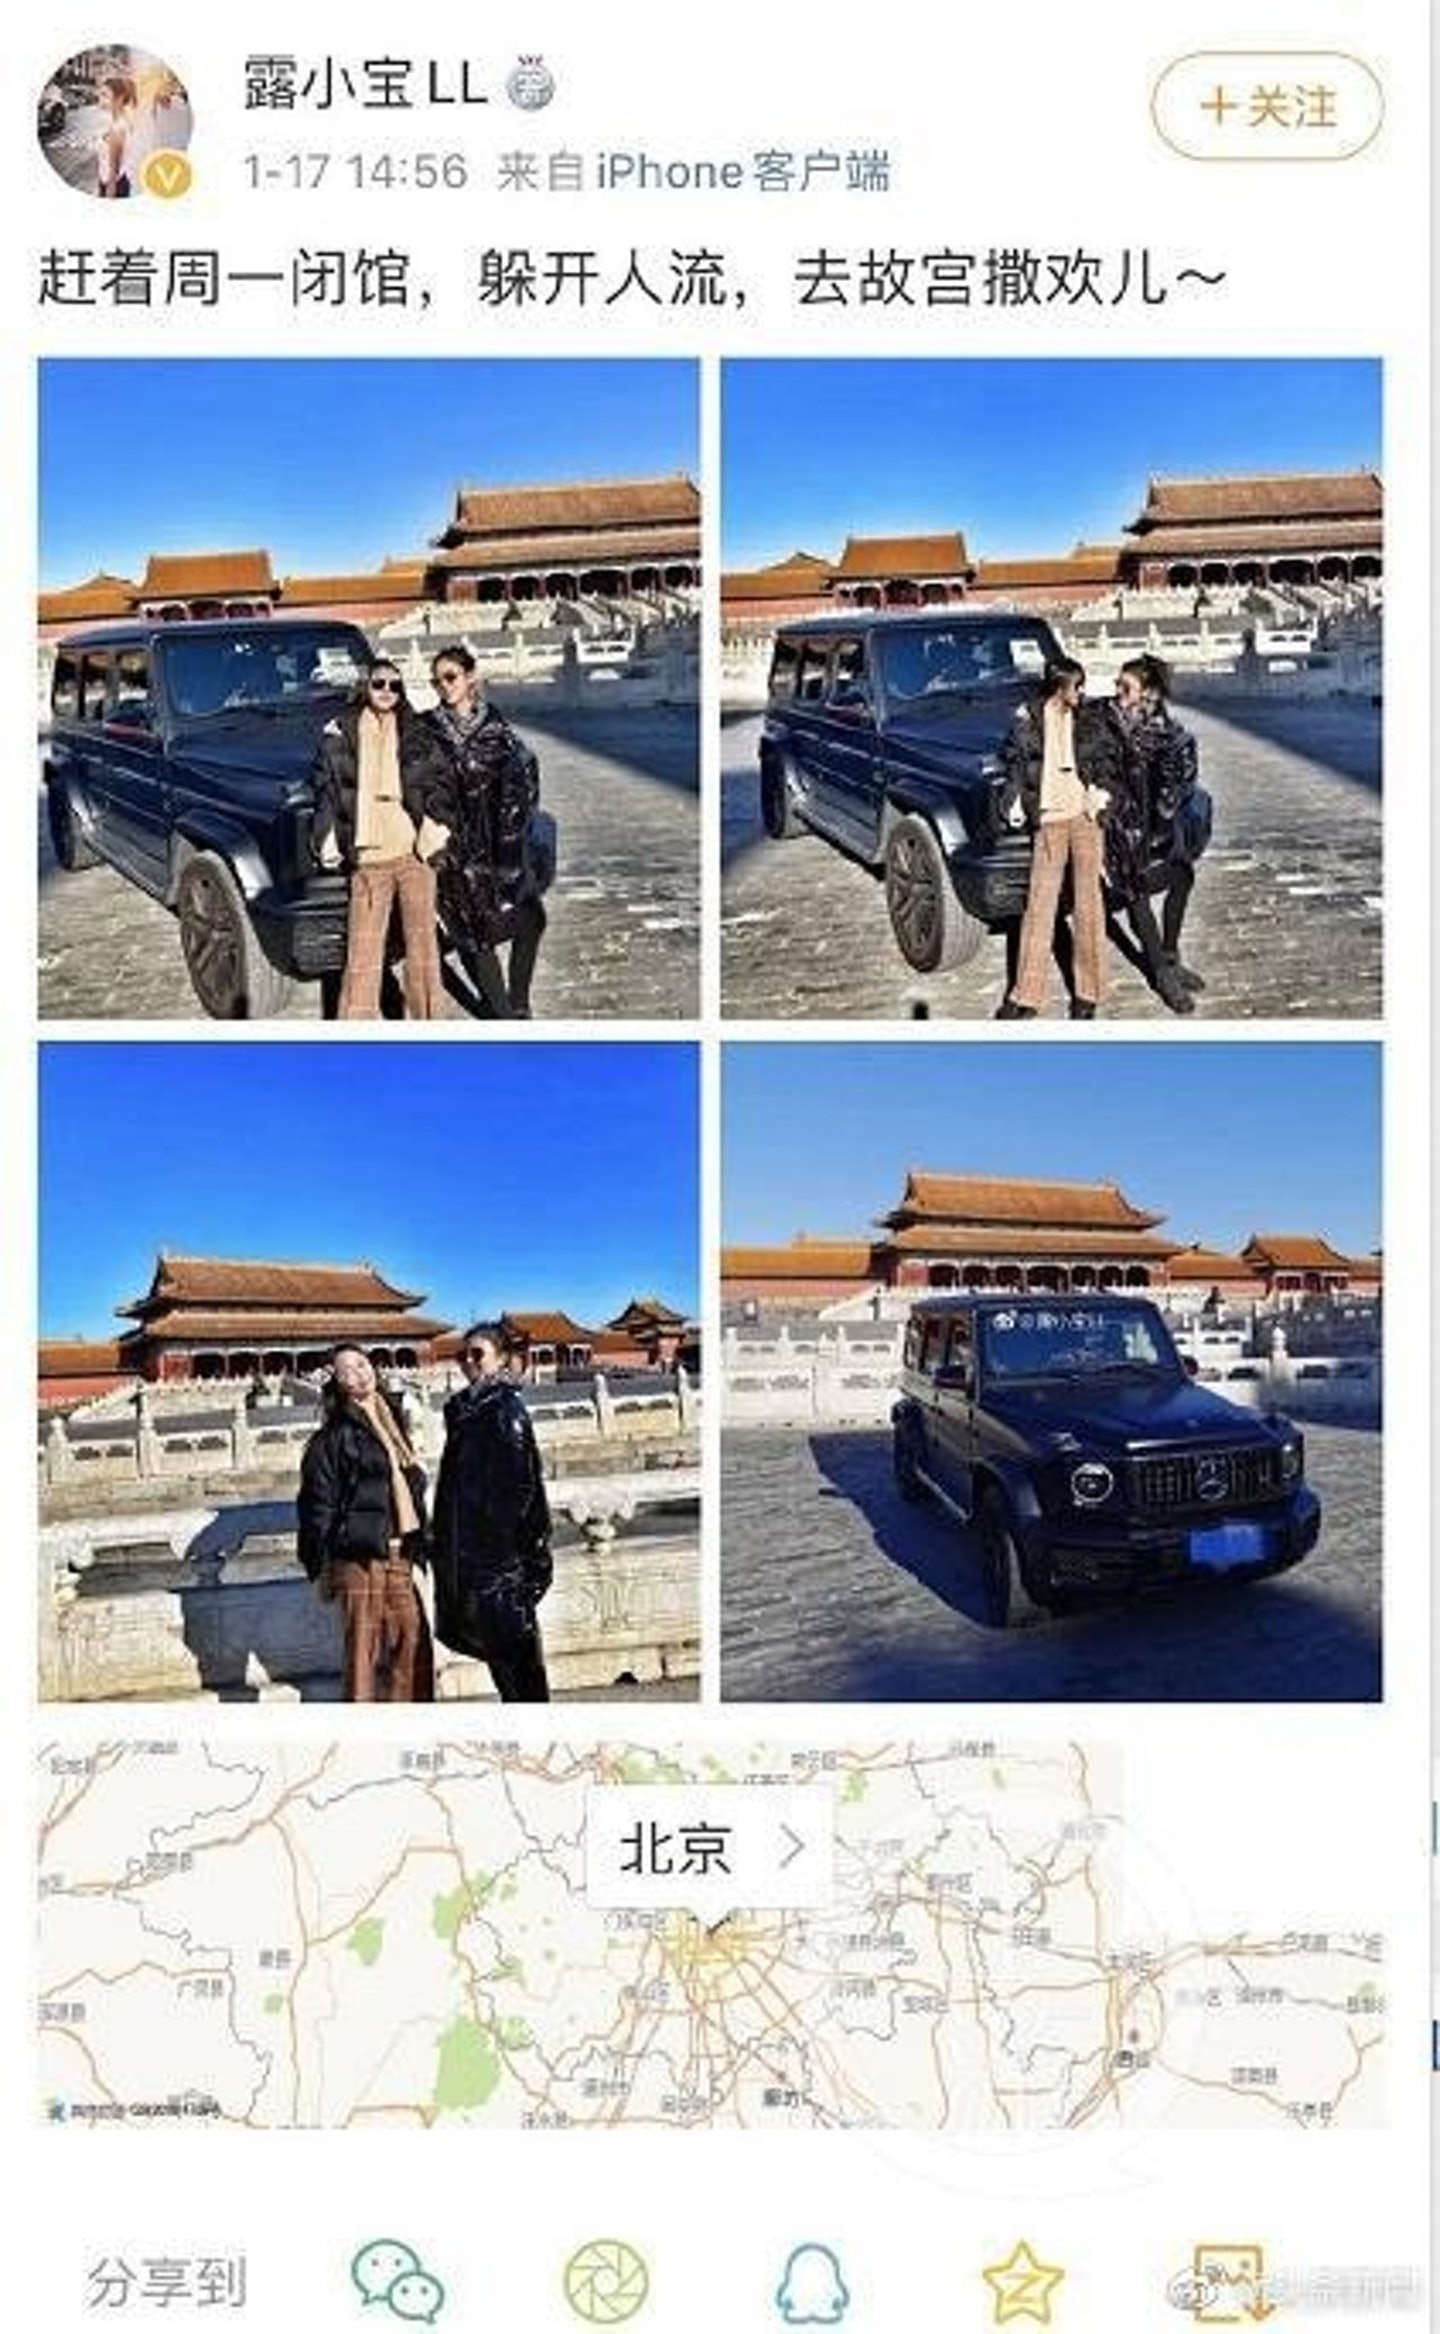 https://cdn.hk01.com/di/media/images/cis/5e243b14fd5cc31c9c2bcccc.jpg/u85A2E5-o8aDIYF-jmEvV4_P4J6nlKGAoTN7x6Eze8c?v=w1440